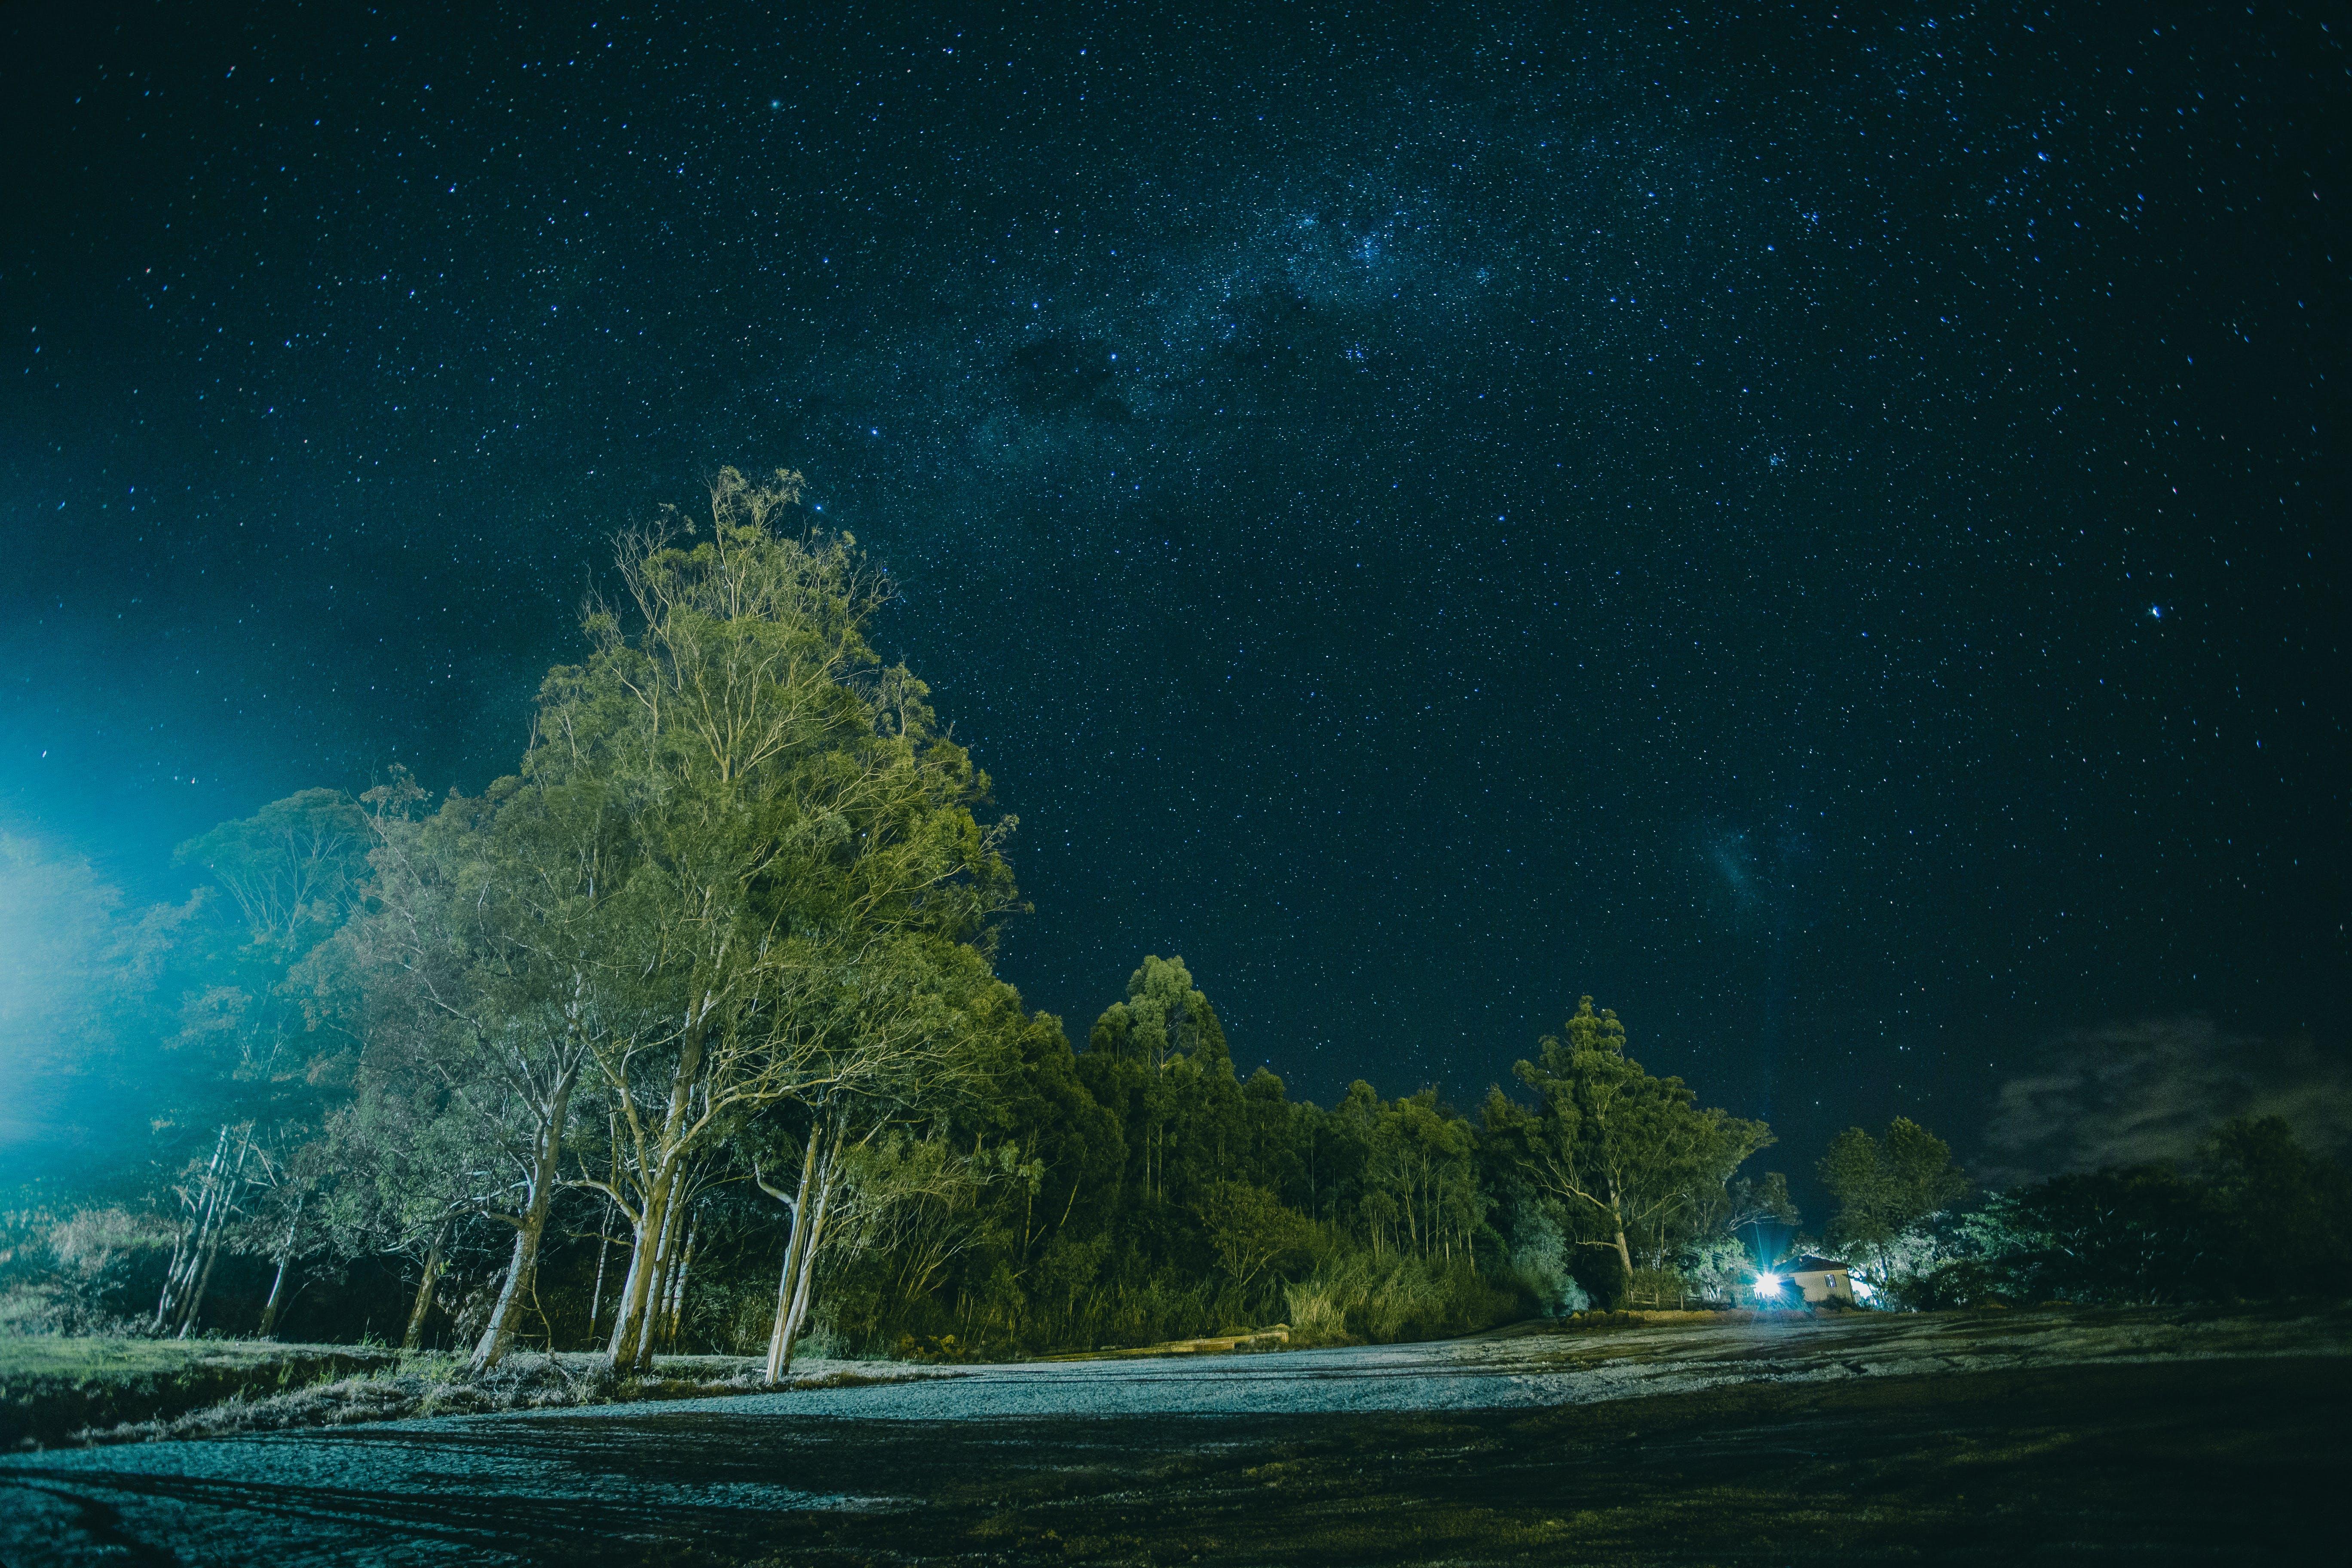 Gratis stockfoto met achtergrondlicht, avond, beroemdheden, bomen